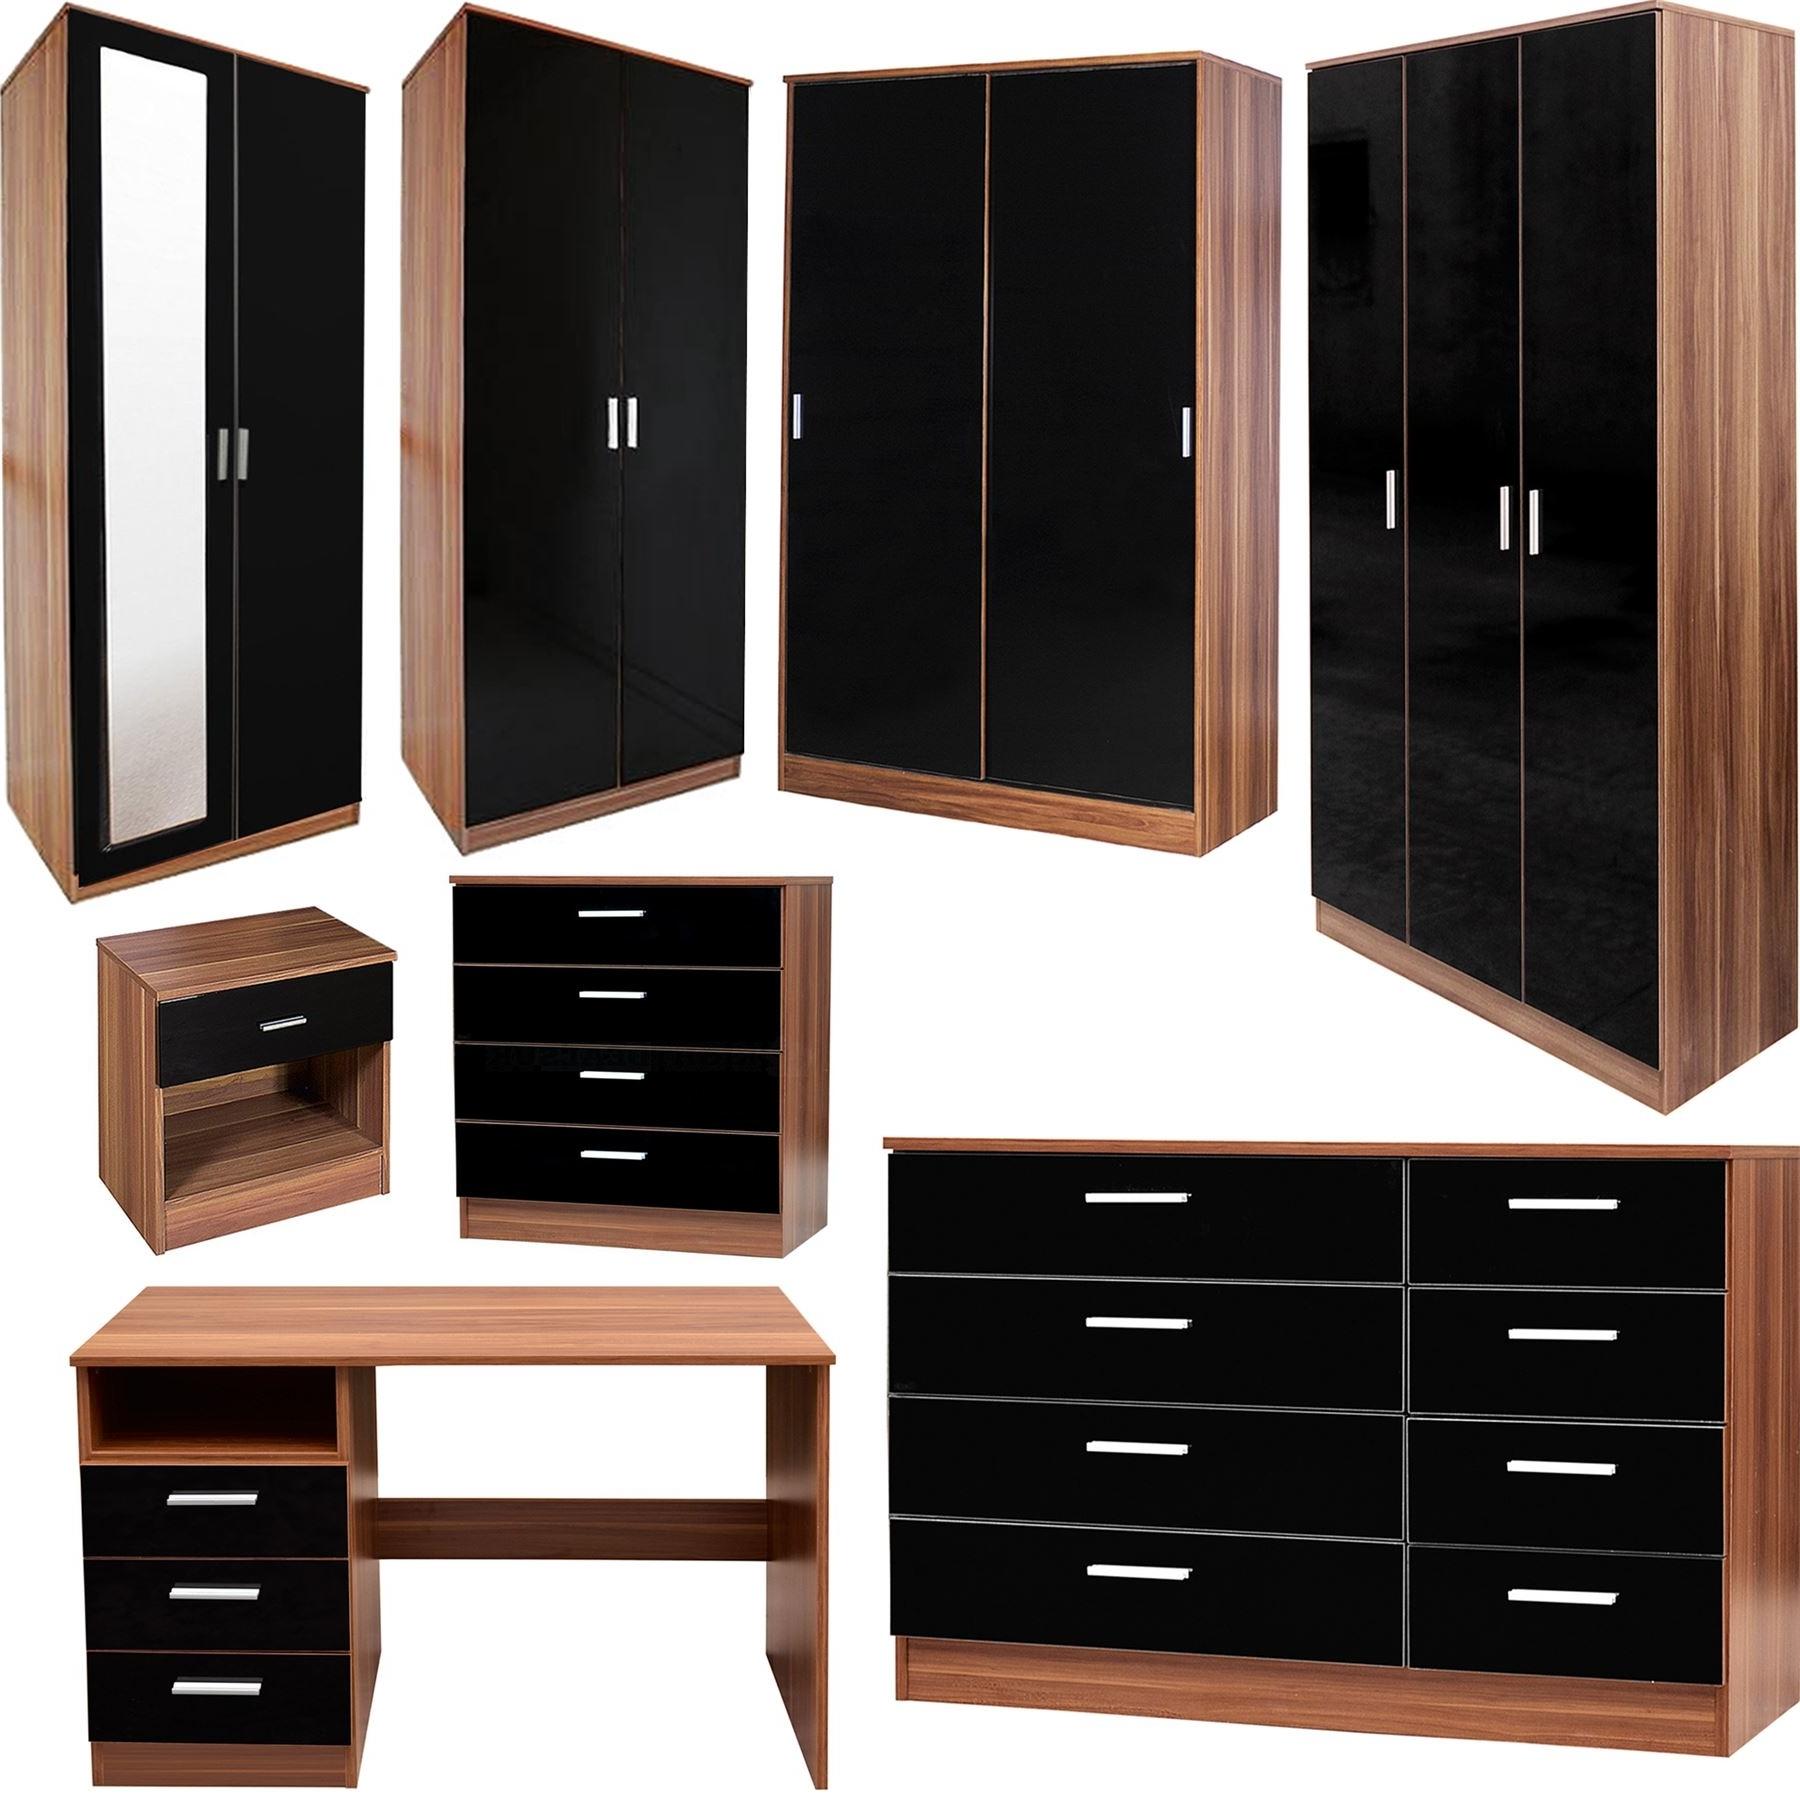 Famous Bedroom Furniture 3 Piece Set Black Gloss & Walnut Wardrobe With Regard To Black Gloss Wardrobes (View 2 of 15)